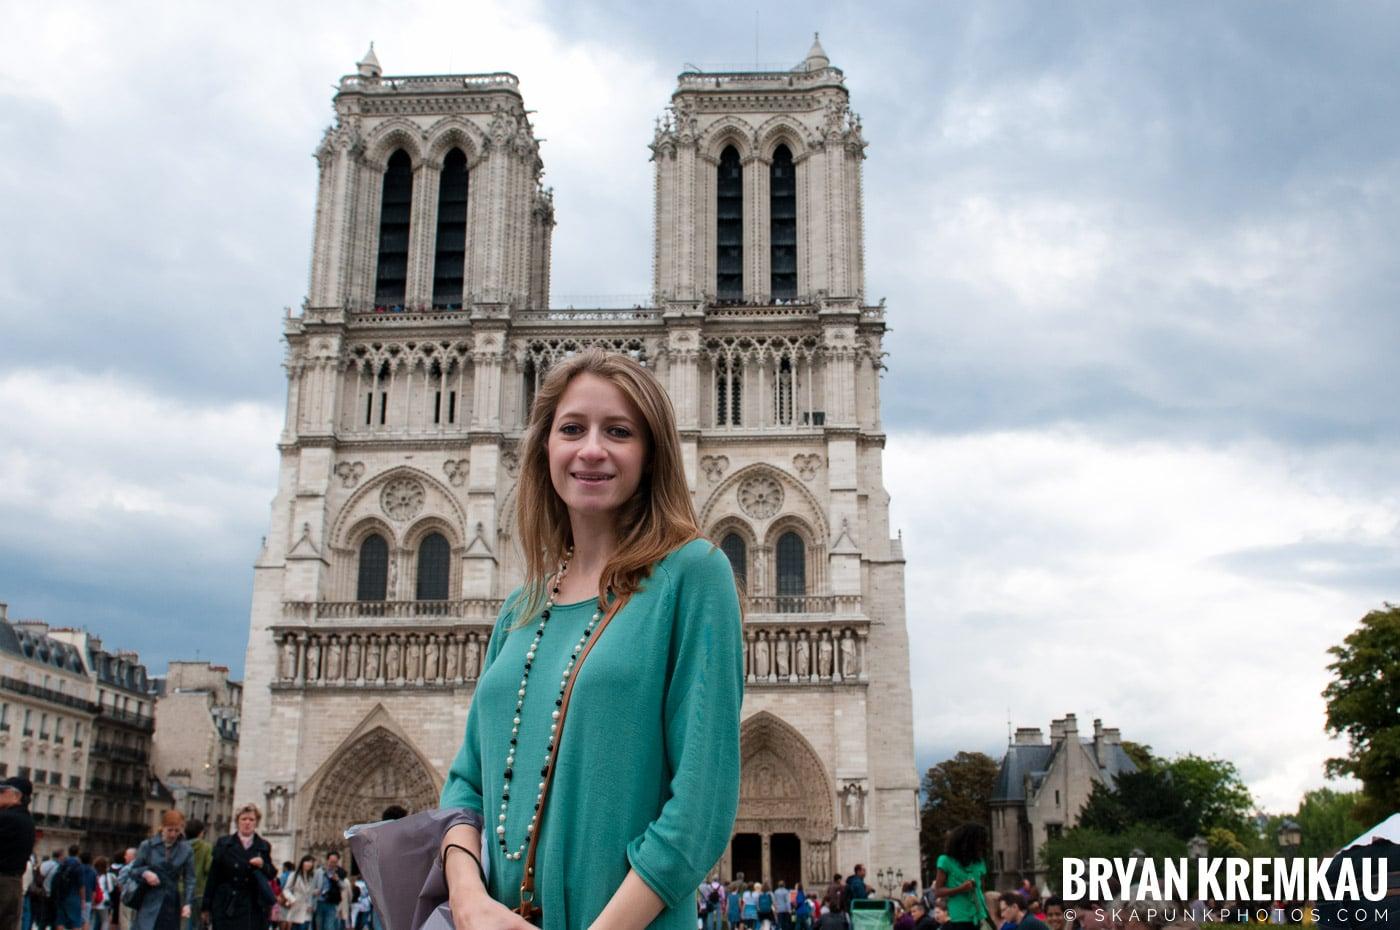 Paris, France Honeymoon - Day 4 - 7.21.11 (4)